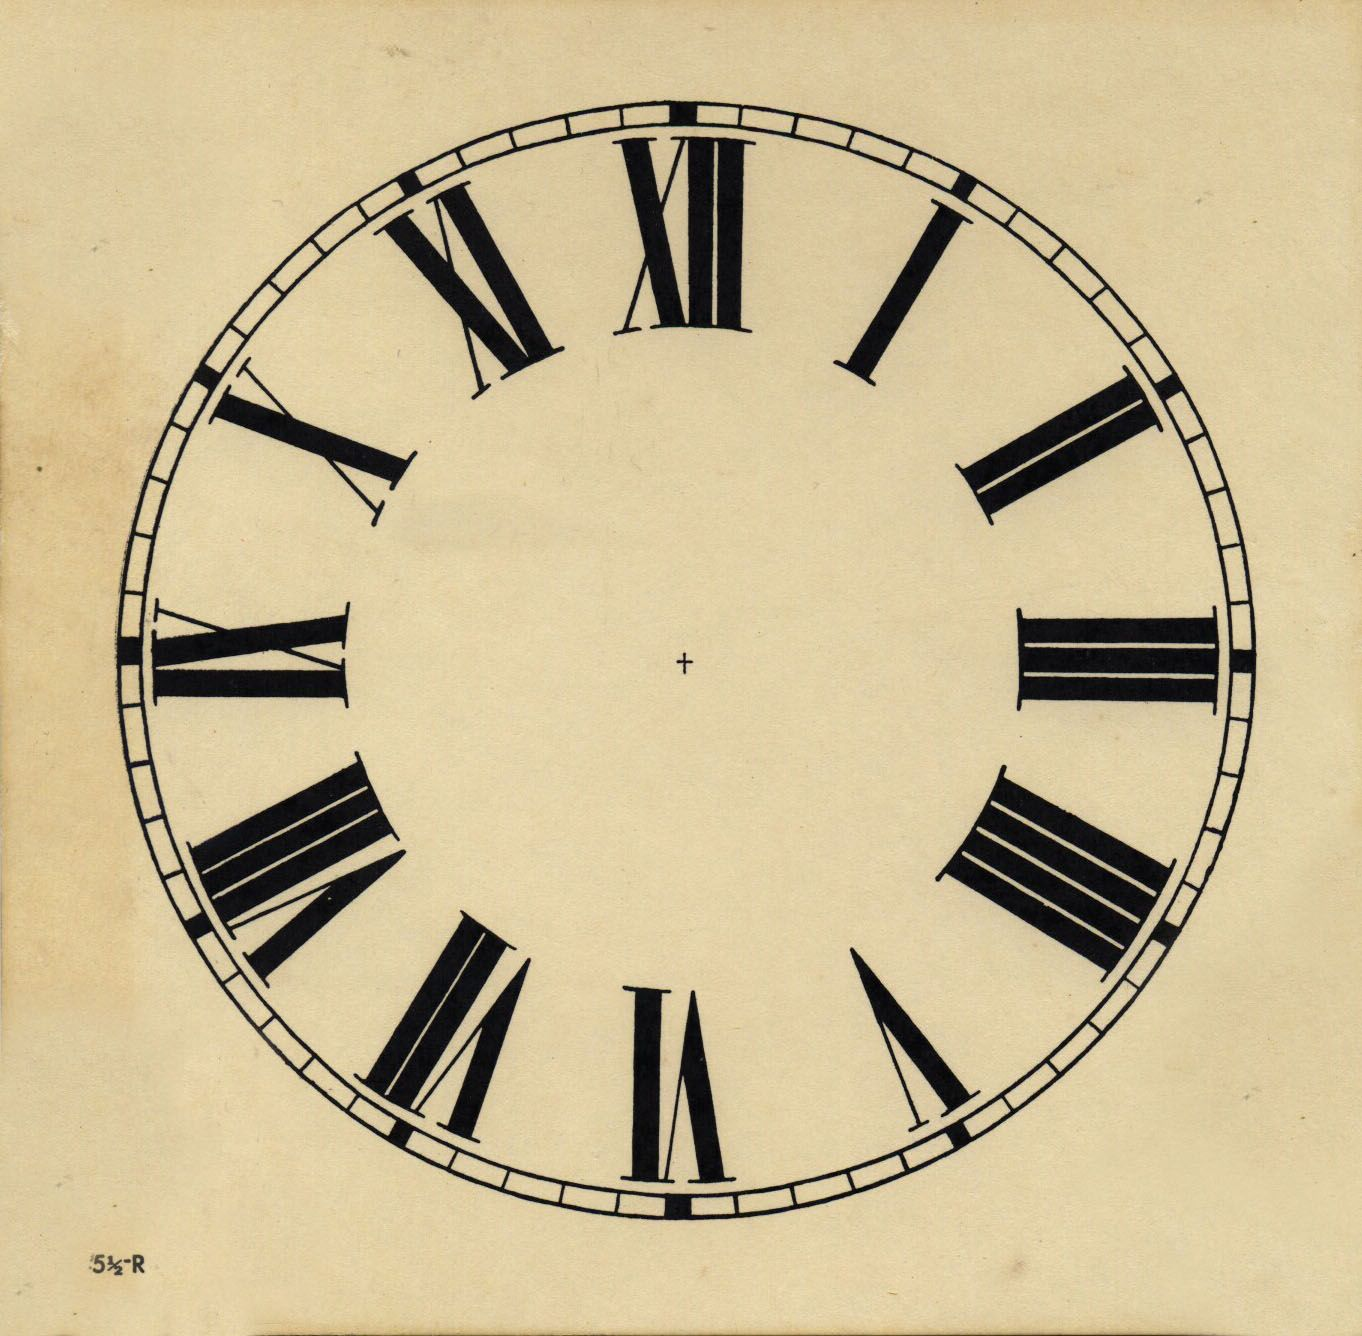 Printable Clock Face | Clocks | Pinterest | Clock faces ...